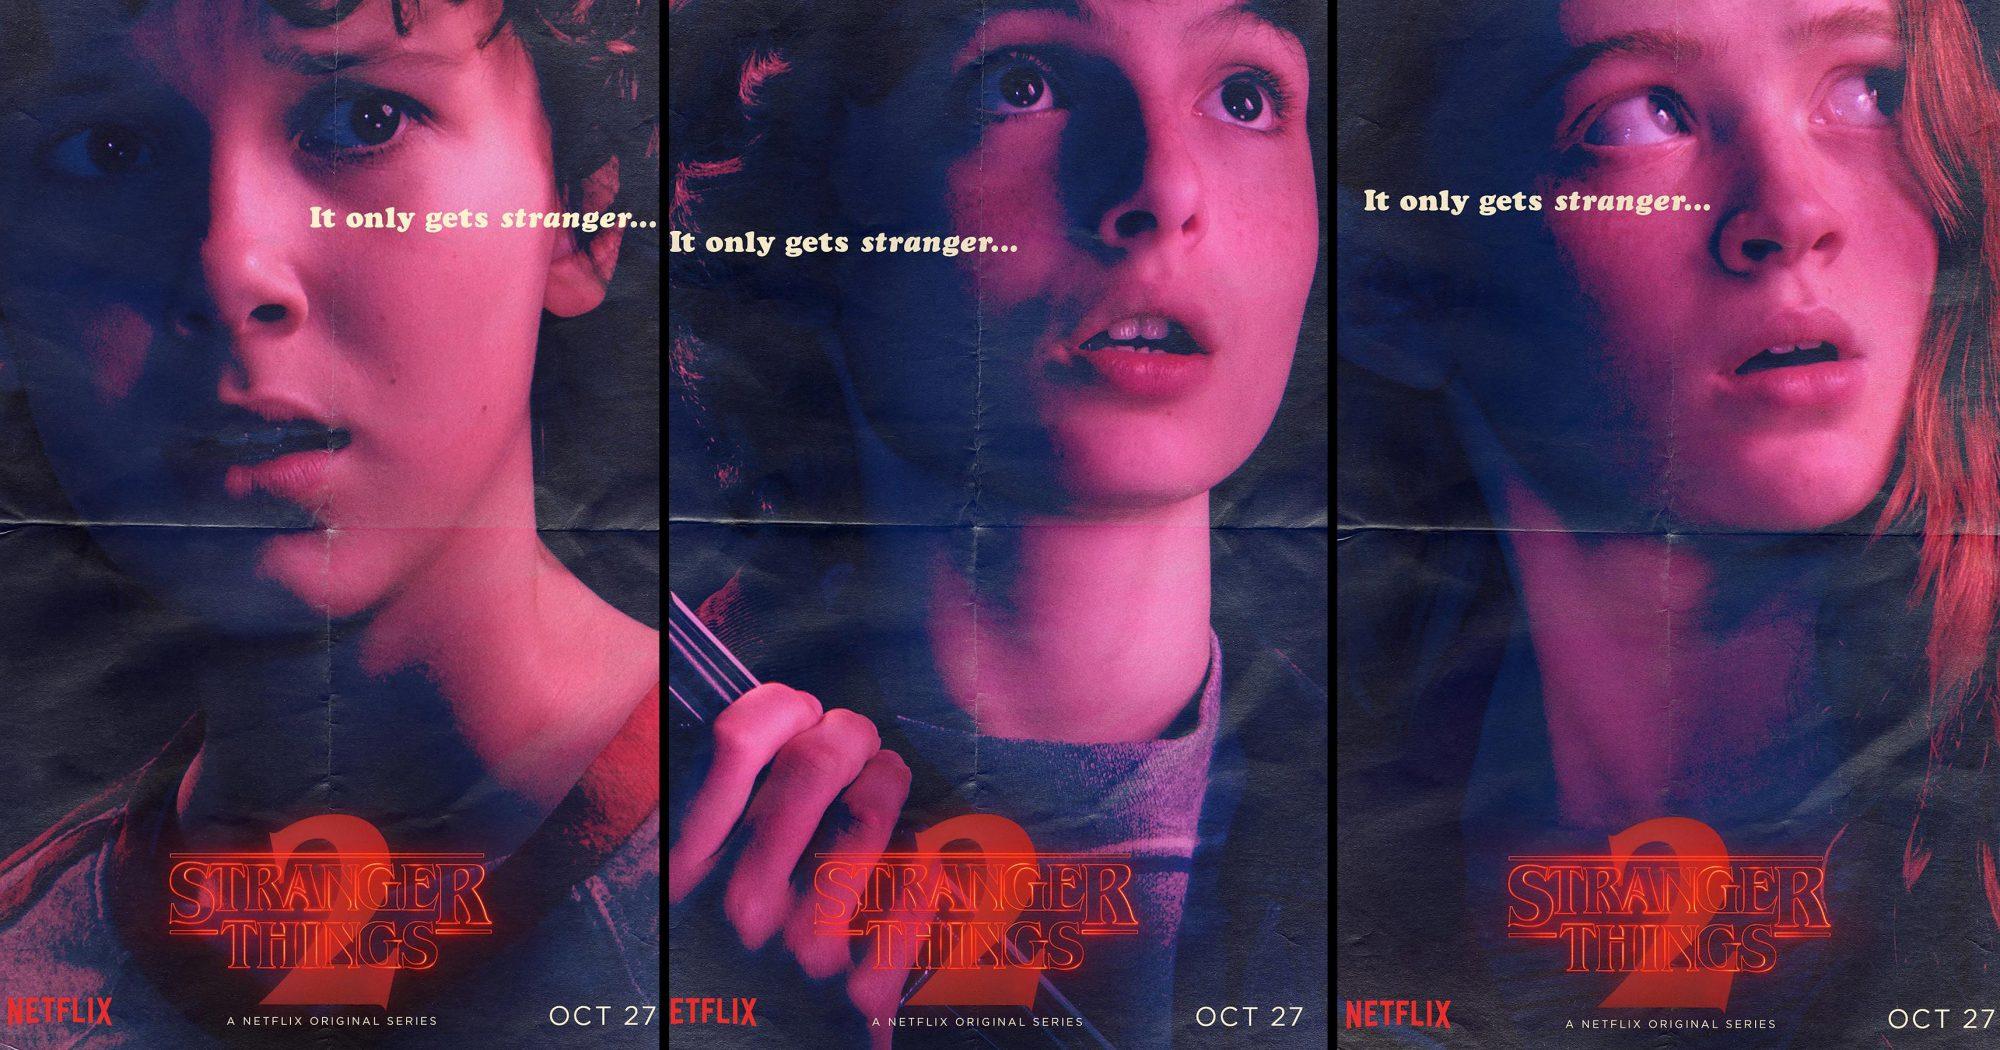 Stranger-Things-Season-2-Posters-Opening-Slide